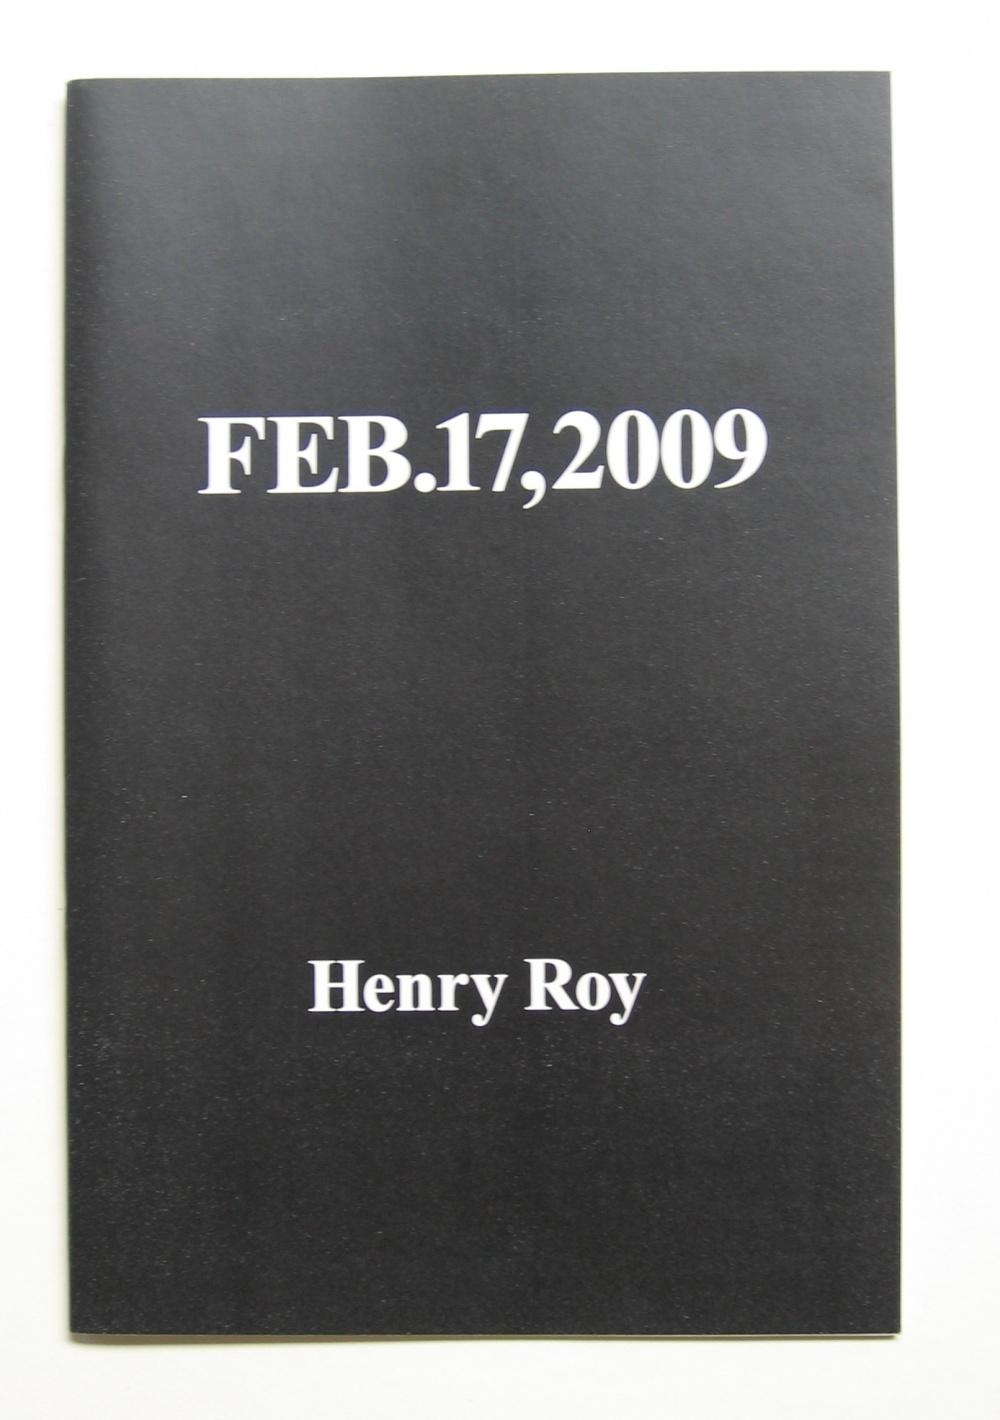 Feb. 17, 2009